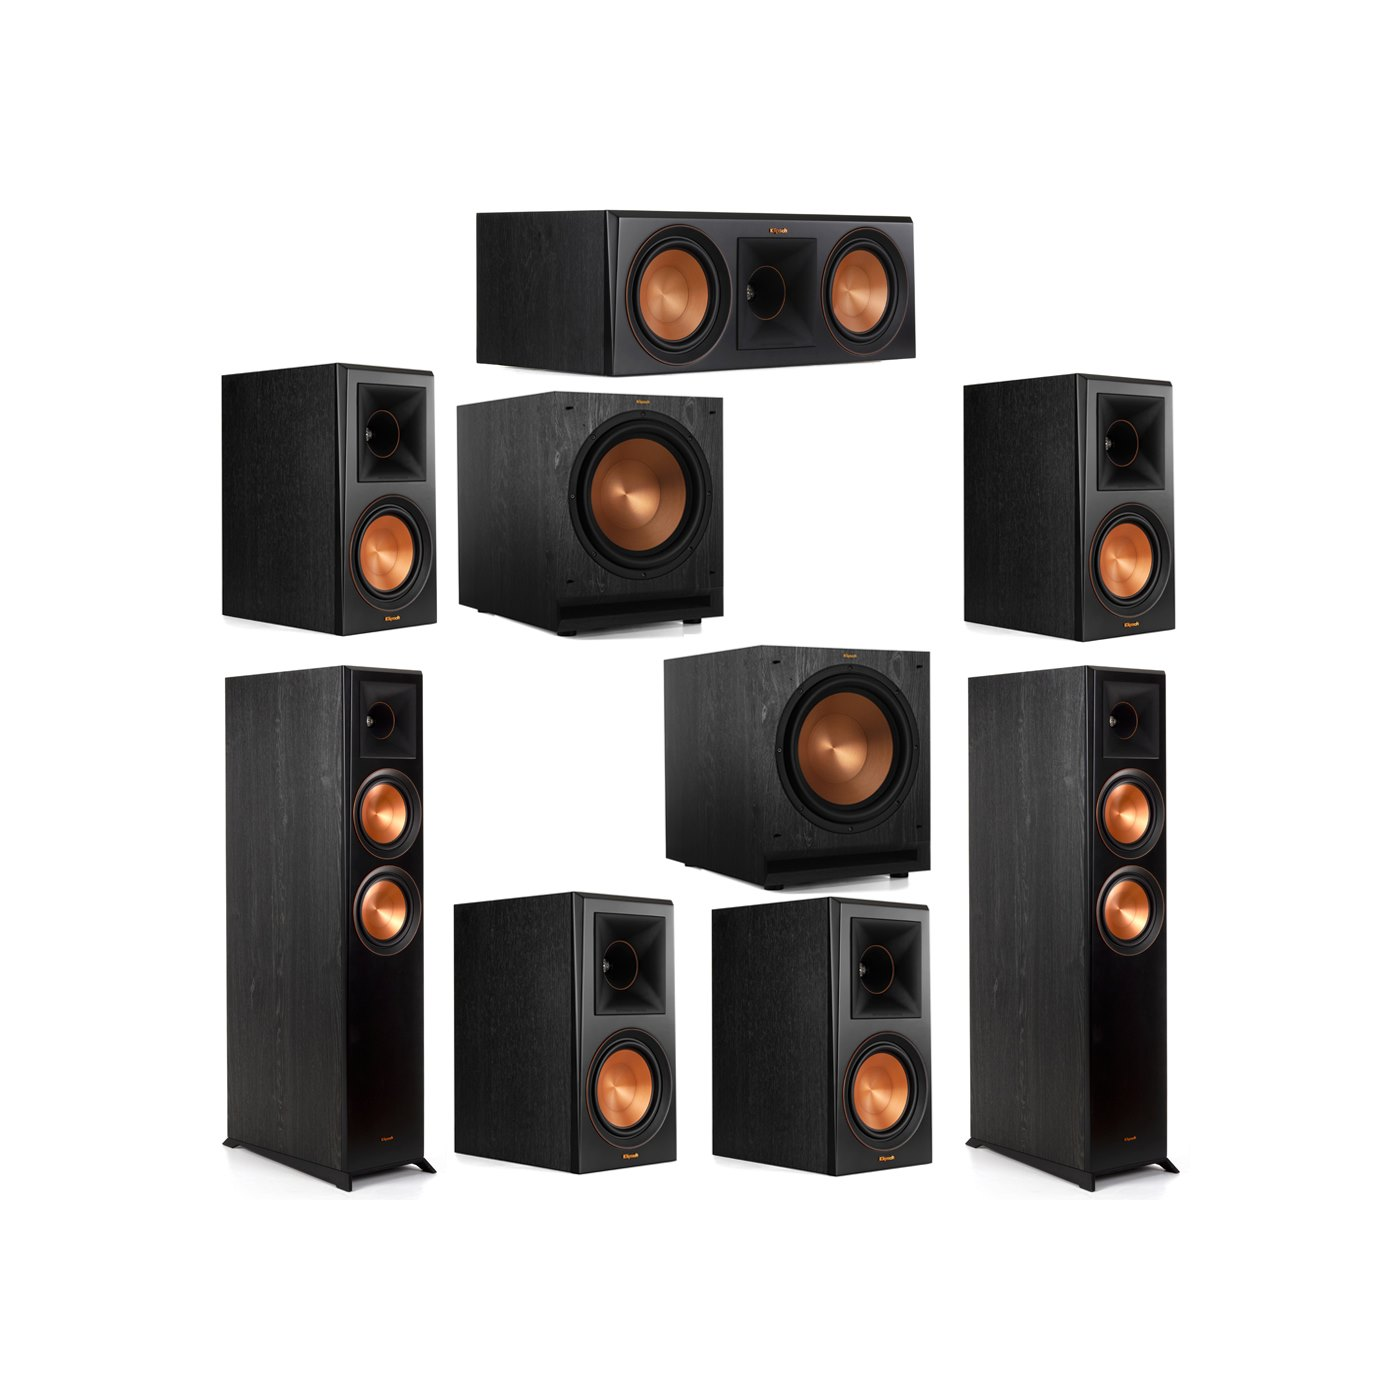 Klipsch 7.2 System with 2 RP-6000F Floorstanding Speakers, 1 Klipsch RP-600C Center Speaker, 4 Klipsch RP-600M Surround Speakers, 2 Klipsch SPL-120 Subwoofers